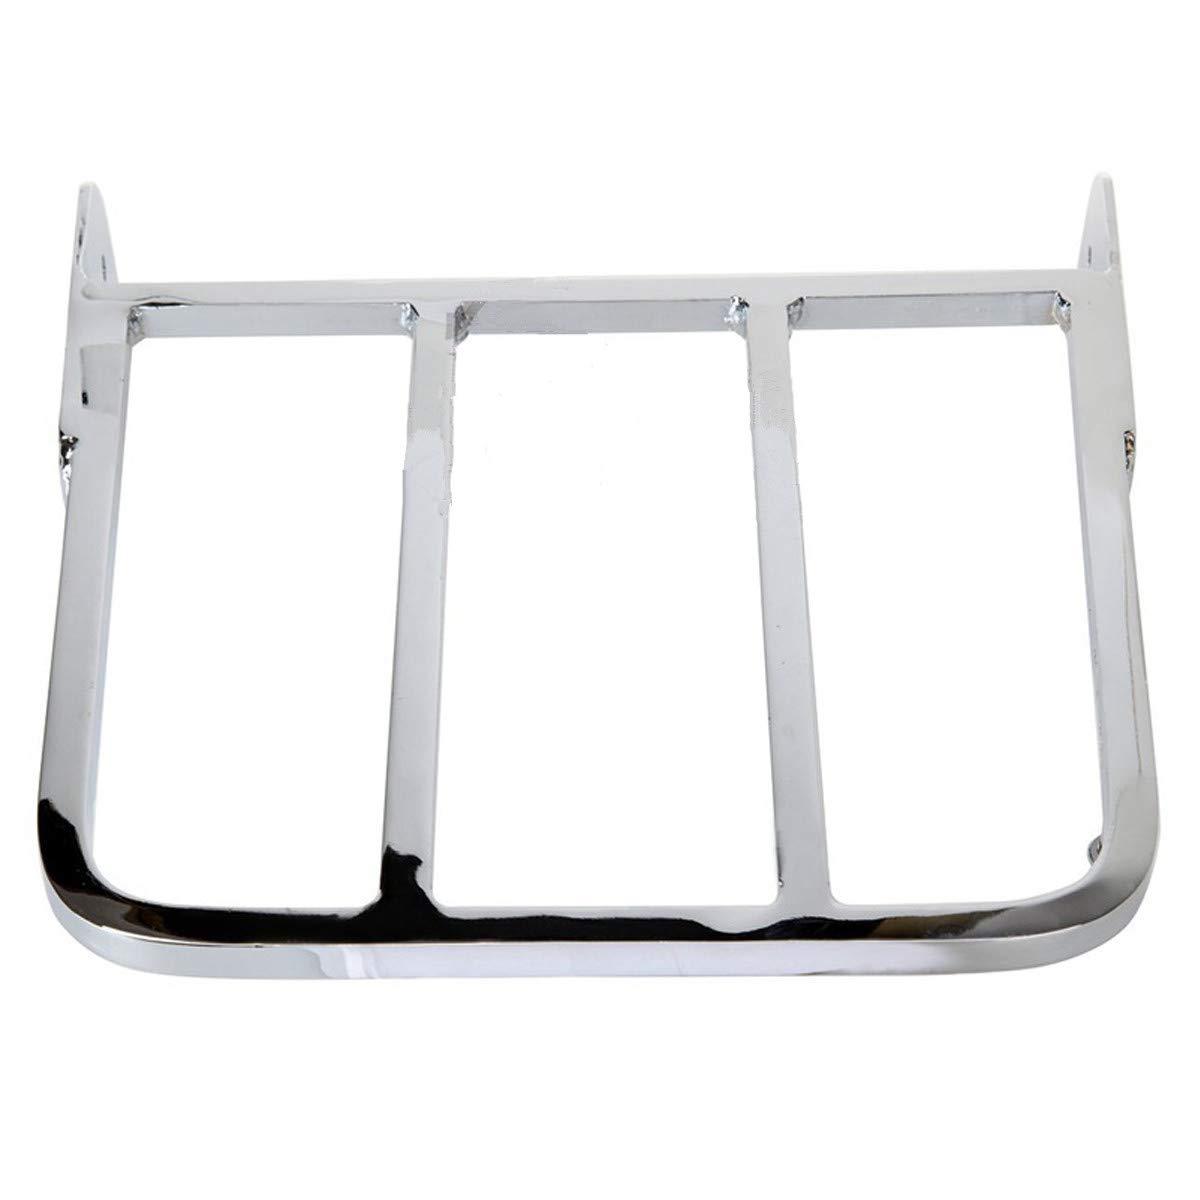 Mingting Chrome Sissy Bar Luggage Rack for Suzuki Boulevard C50 05-11 M50 05-09